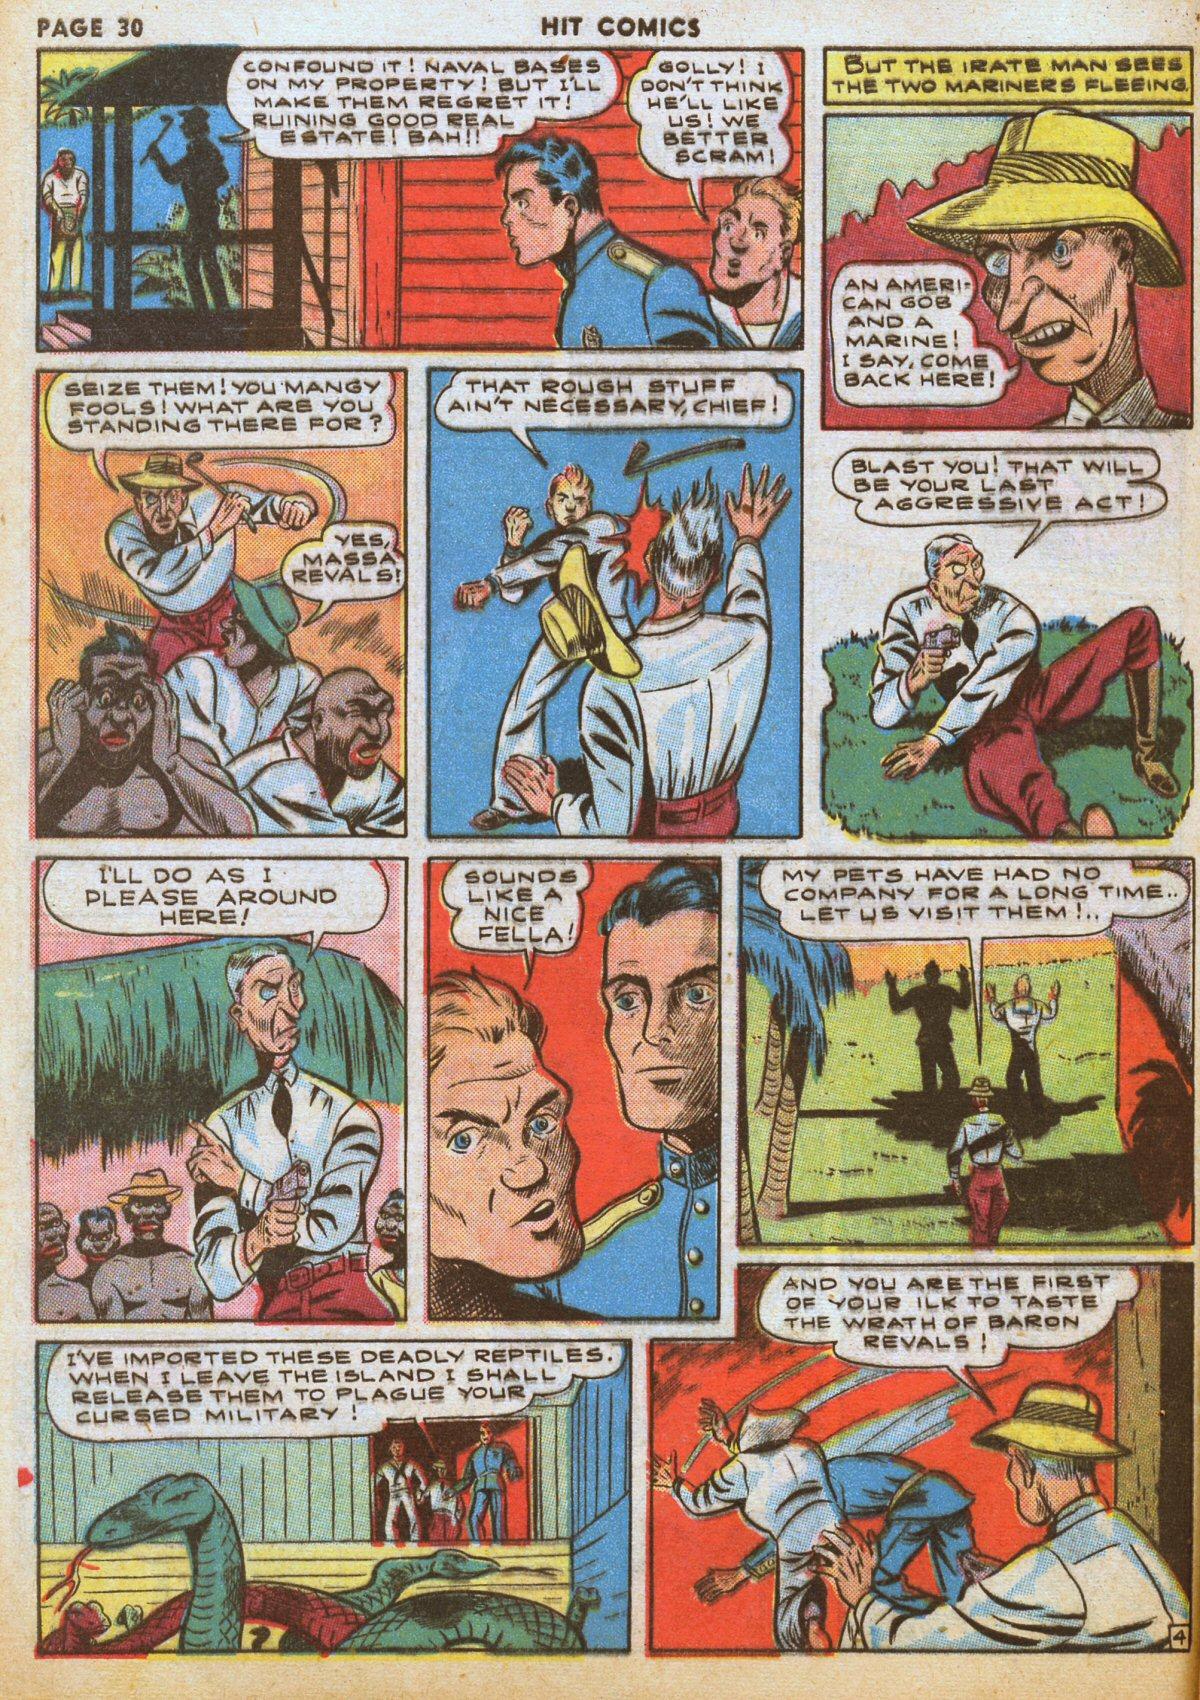 Read online Hit Comics comic -  Issue #12 - 32